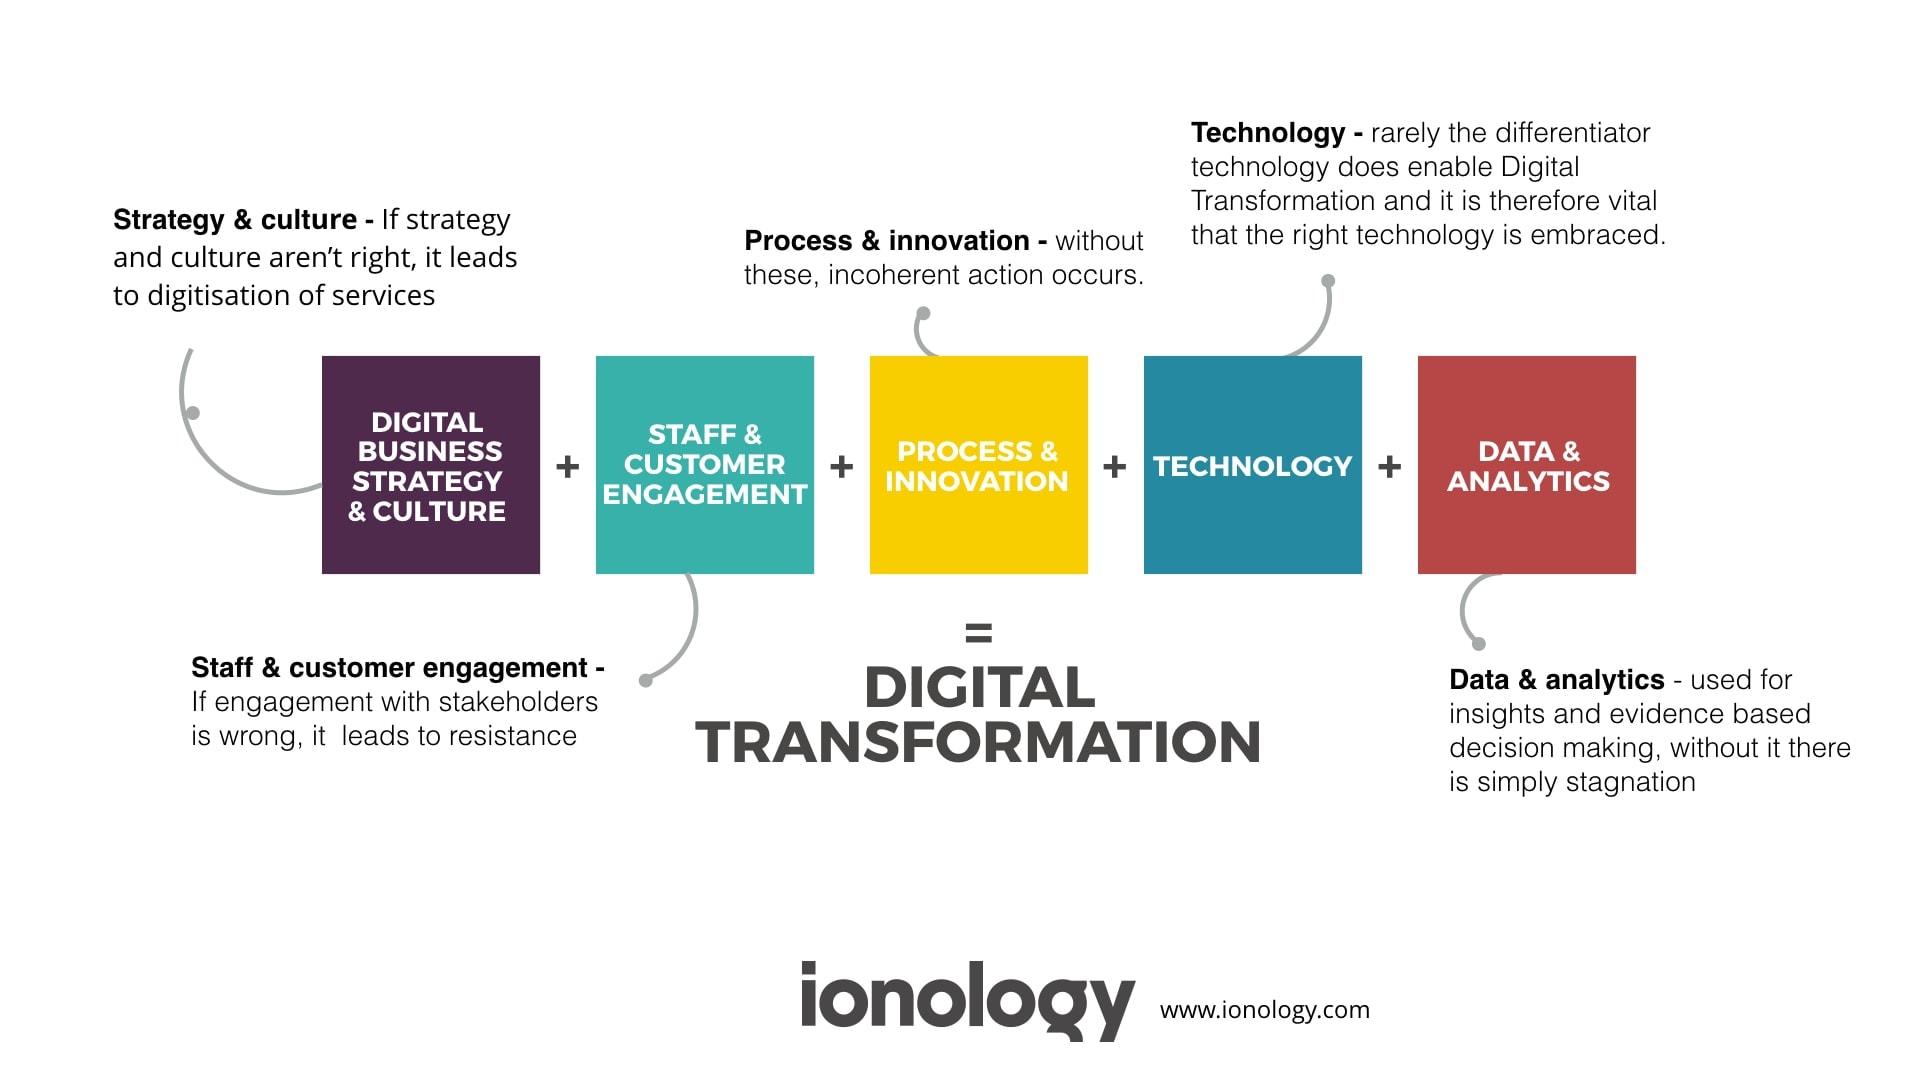 5 Change Blocks of Digital Transformation